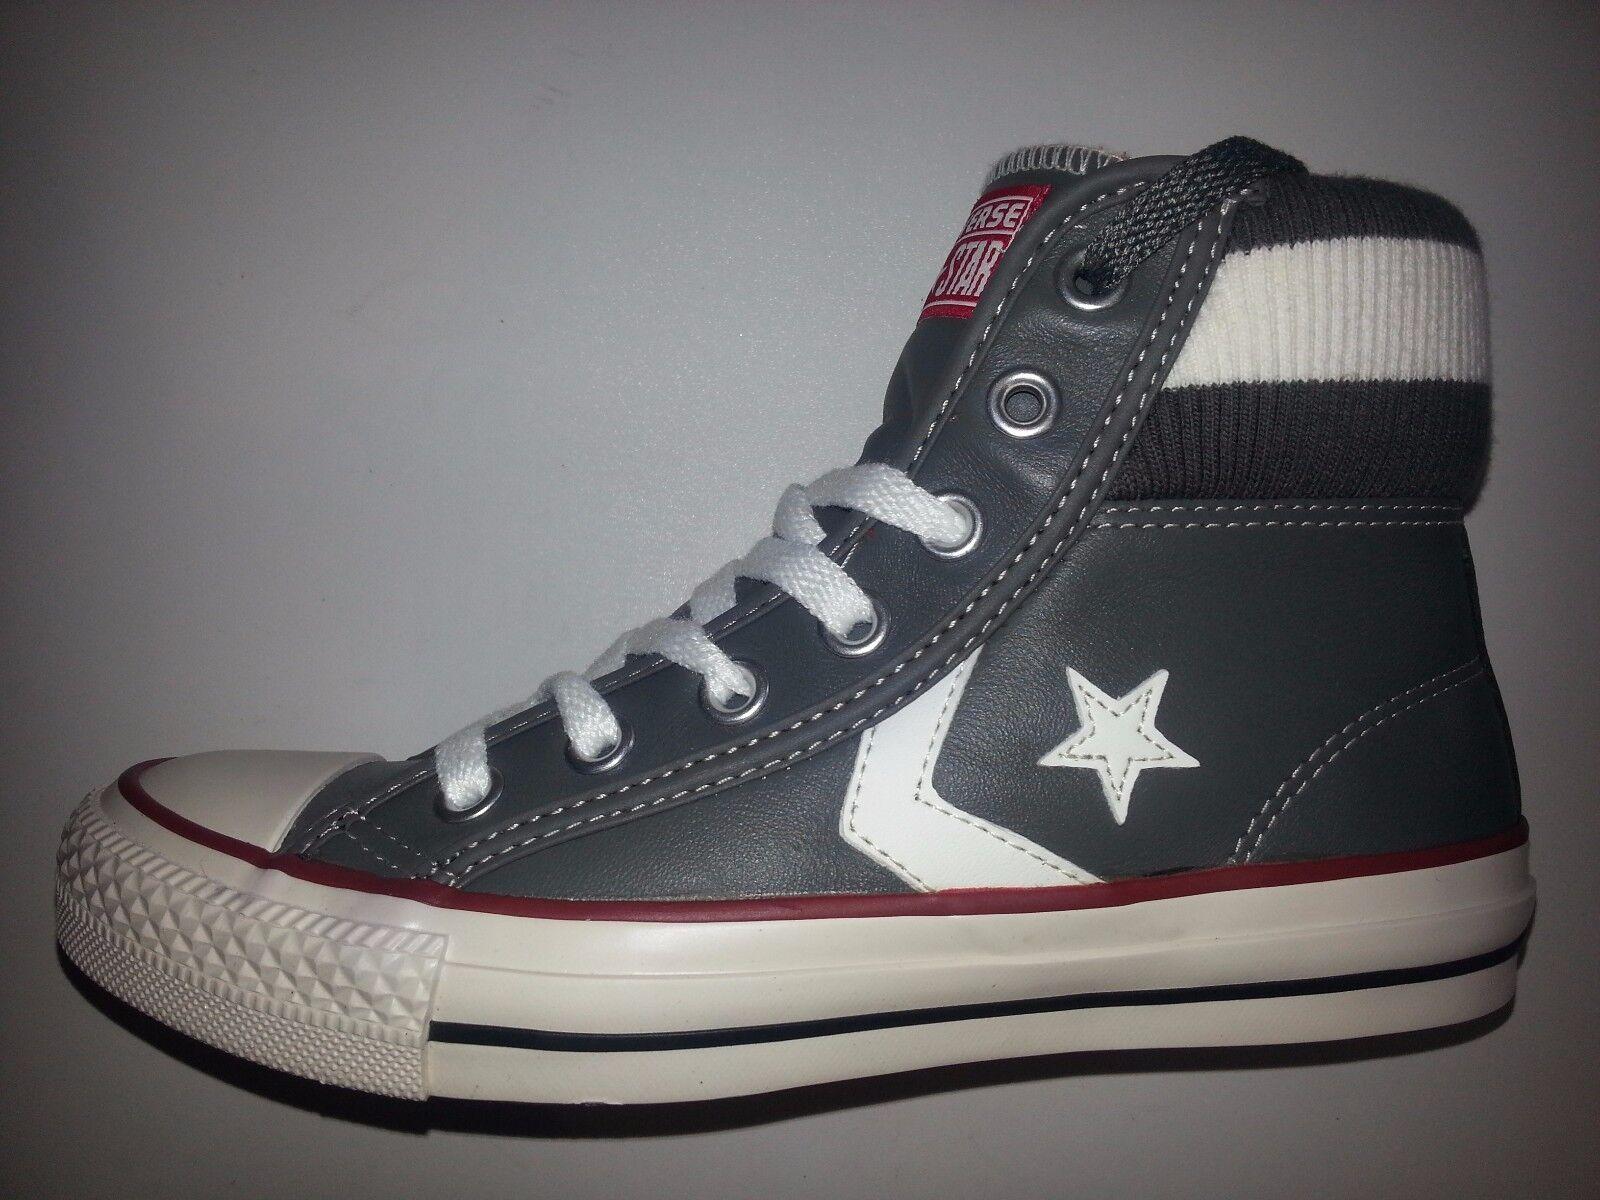 dd3d2c35bc ... Converse Star Player Cuf Damen Mädchen Leder Sneaker grau-weiß Größe 36  NEU, Converse All Star Fulton OX Leder Sneaker Damen & Kinder Chucks ...